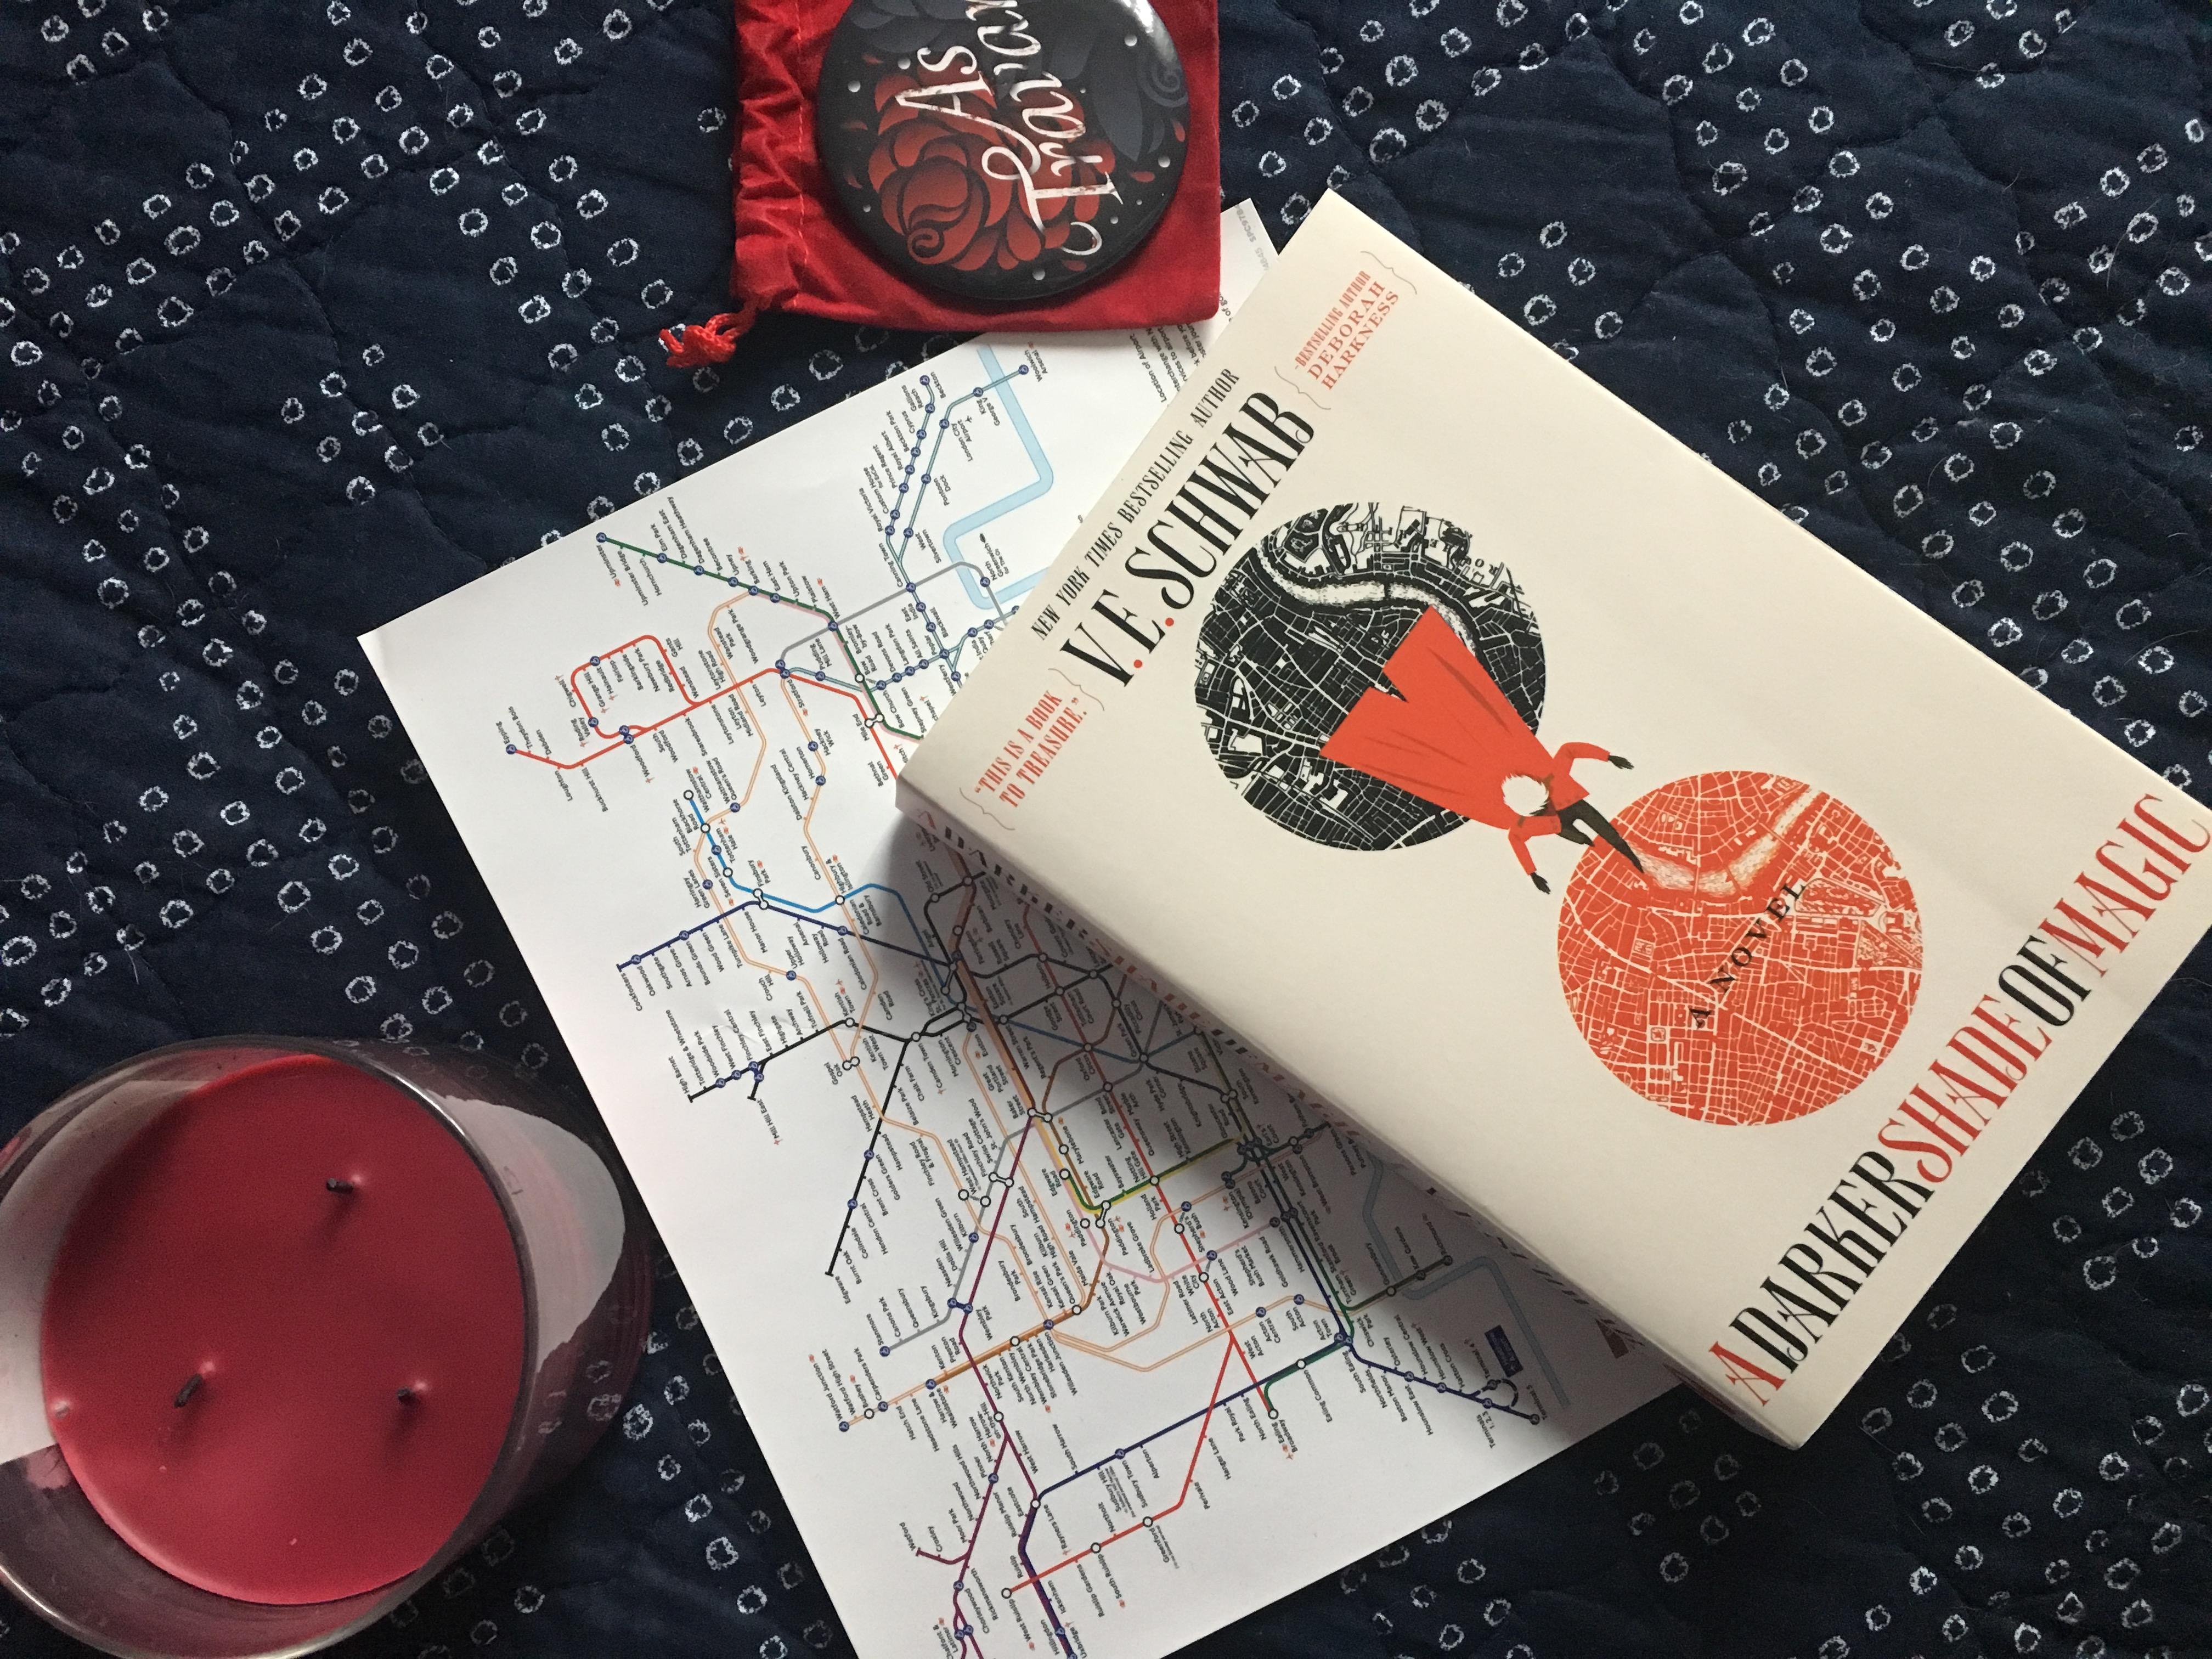 A Darker Shade of Magic by V.E. Schwab: A Book Review